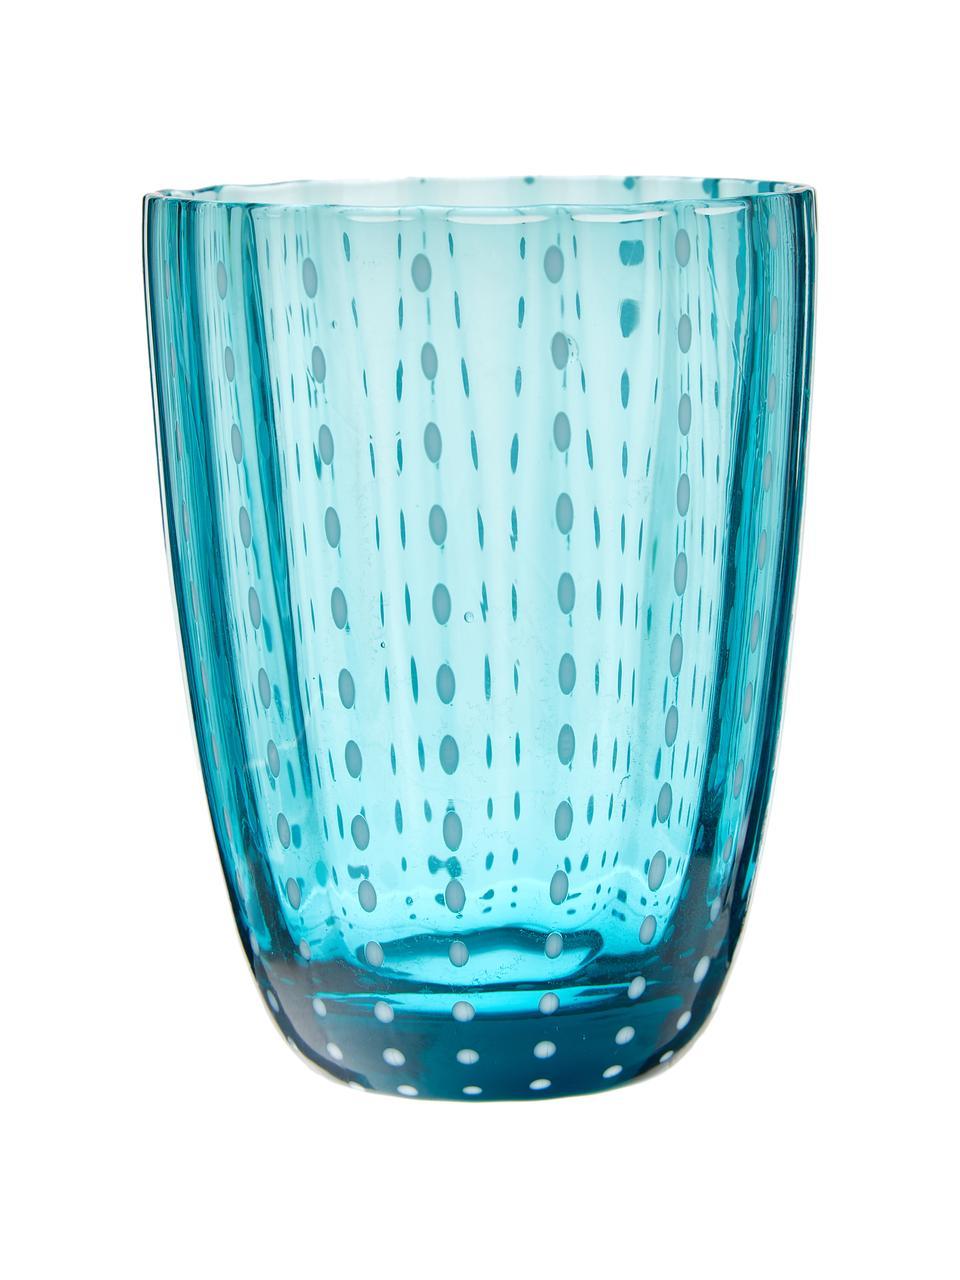 Waterglazen Kalahari, 6 stuks, Glas, Multicolour, Ø 9 x H 11 cm